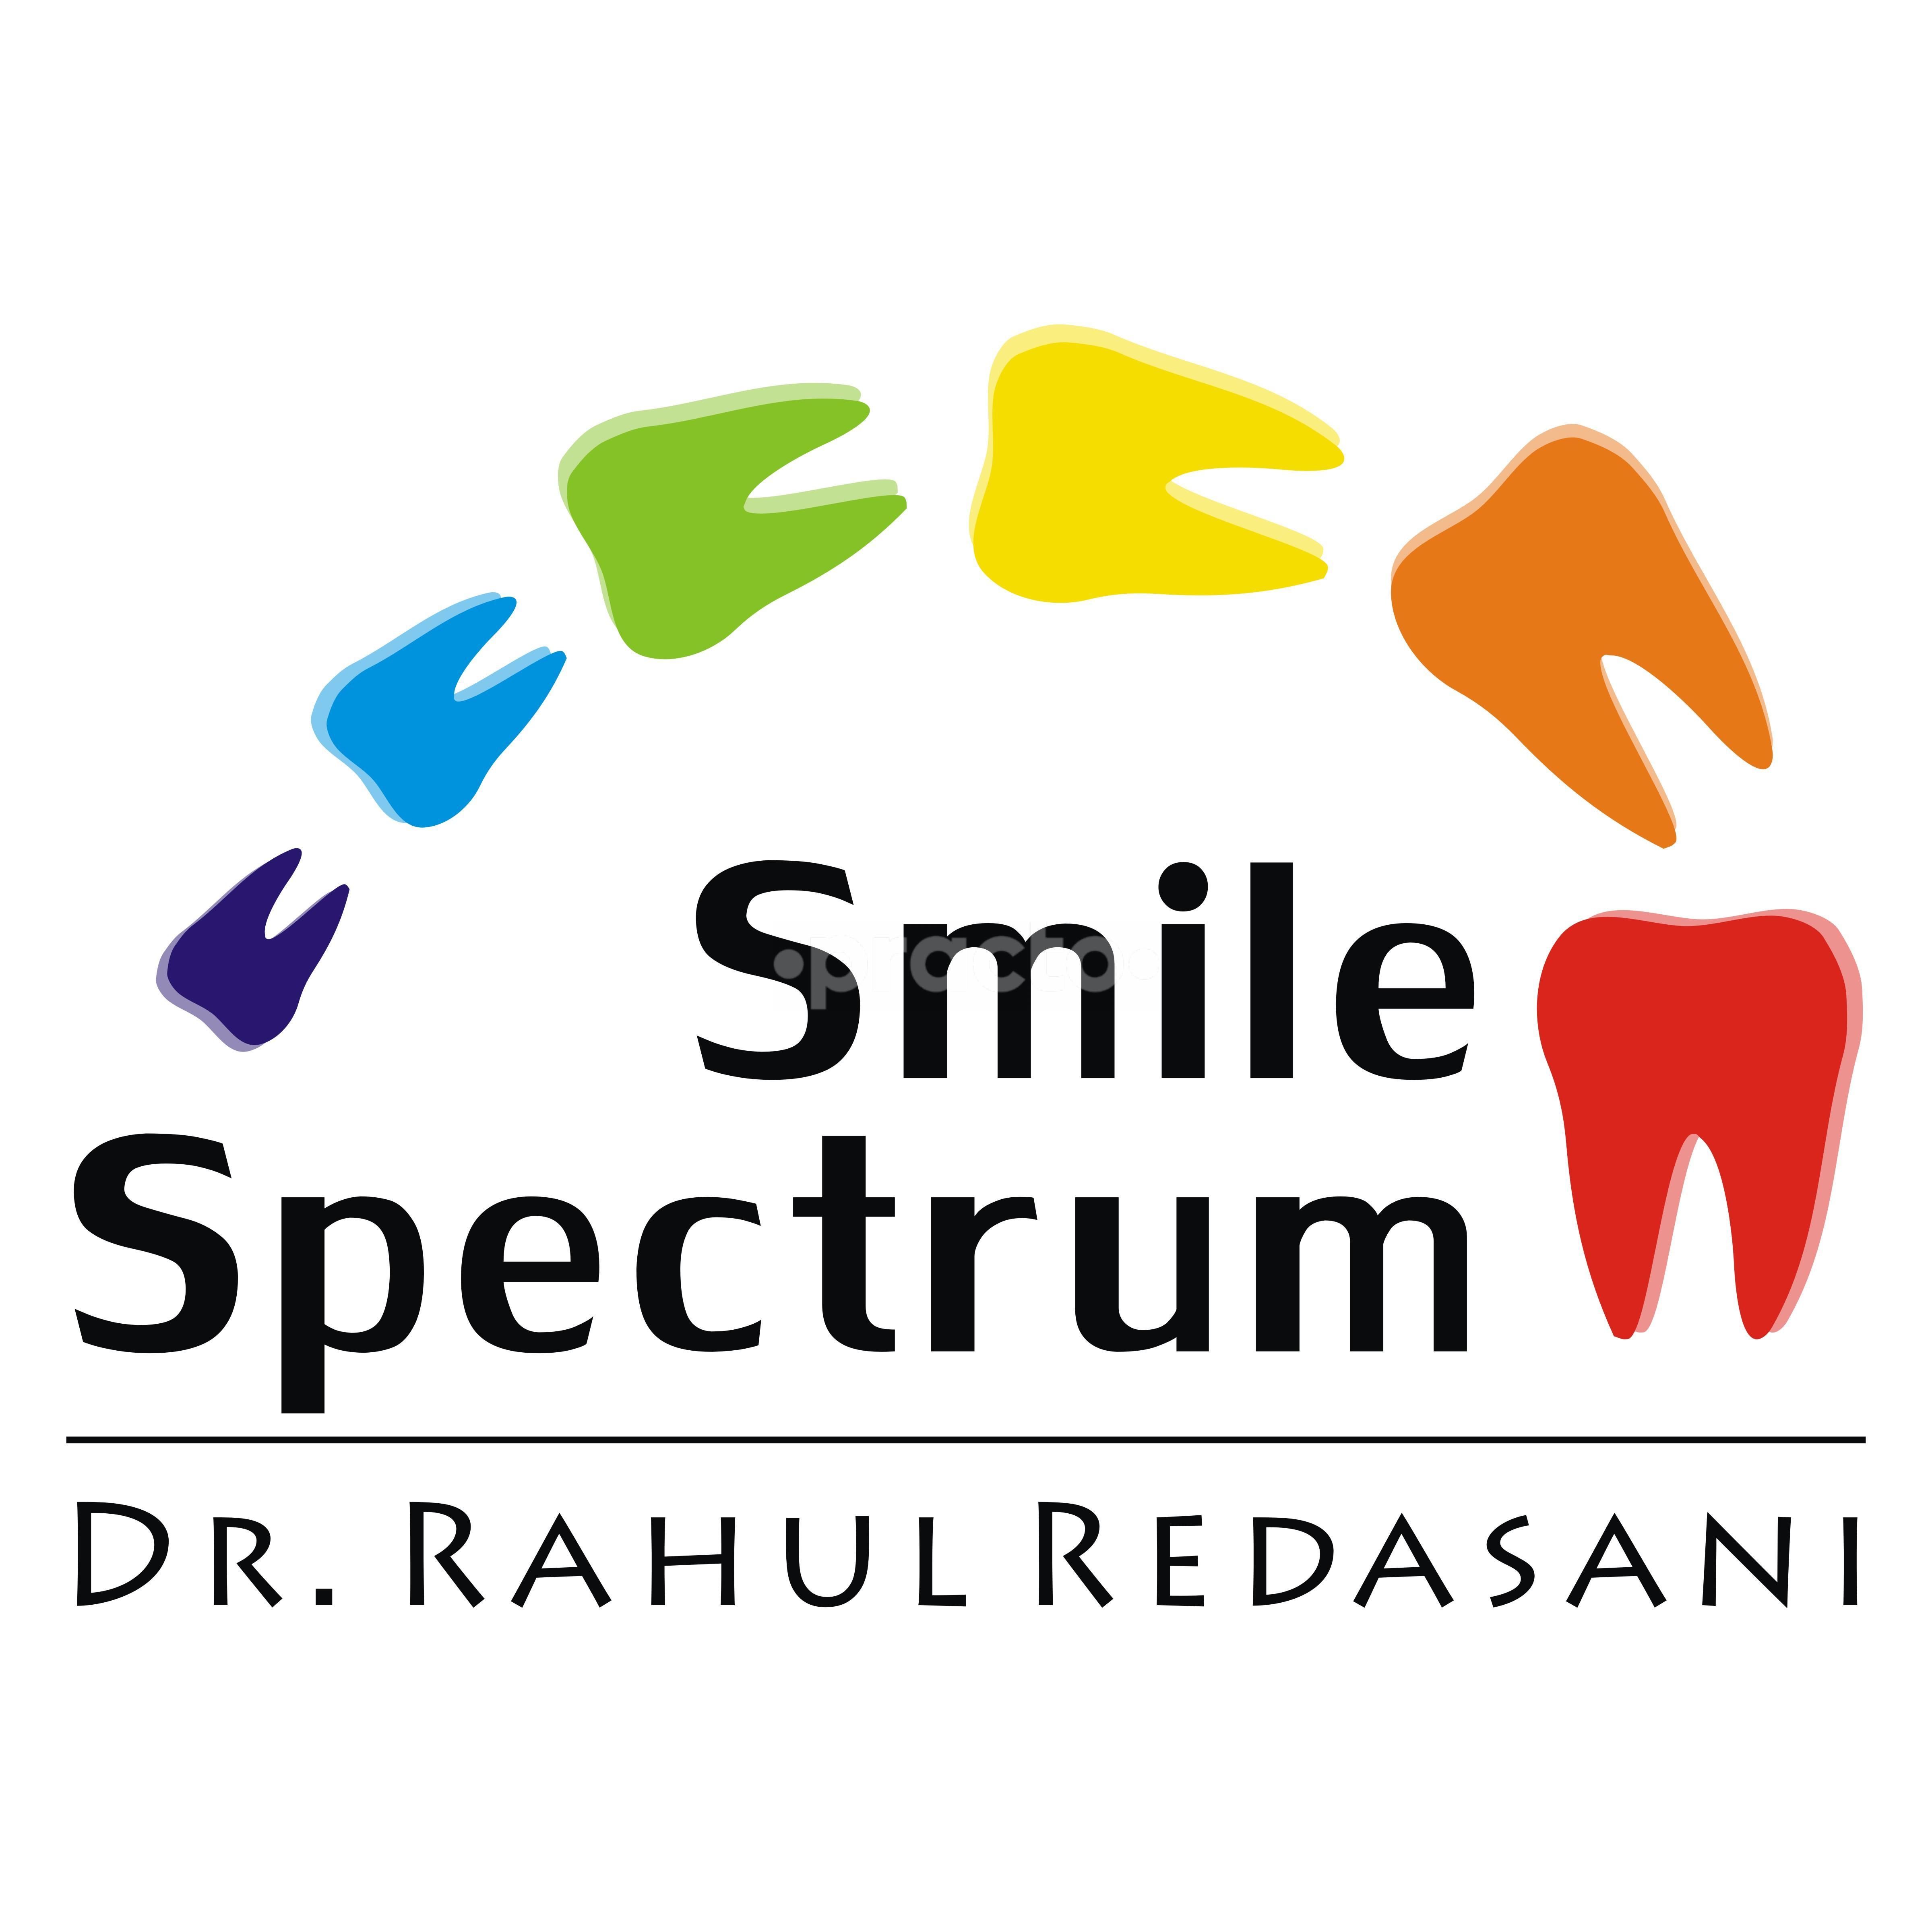 Smiles Spectrum